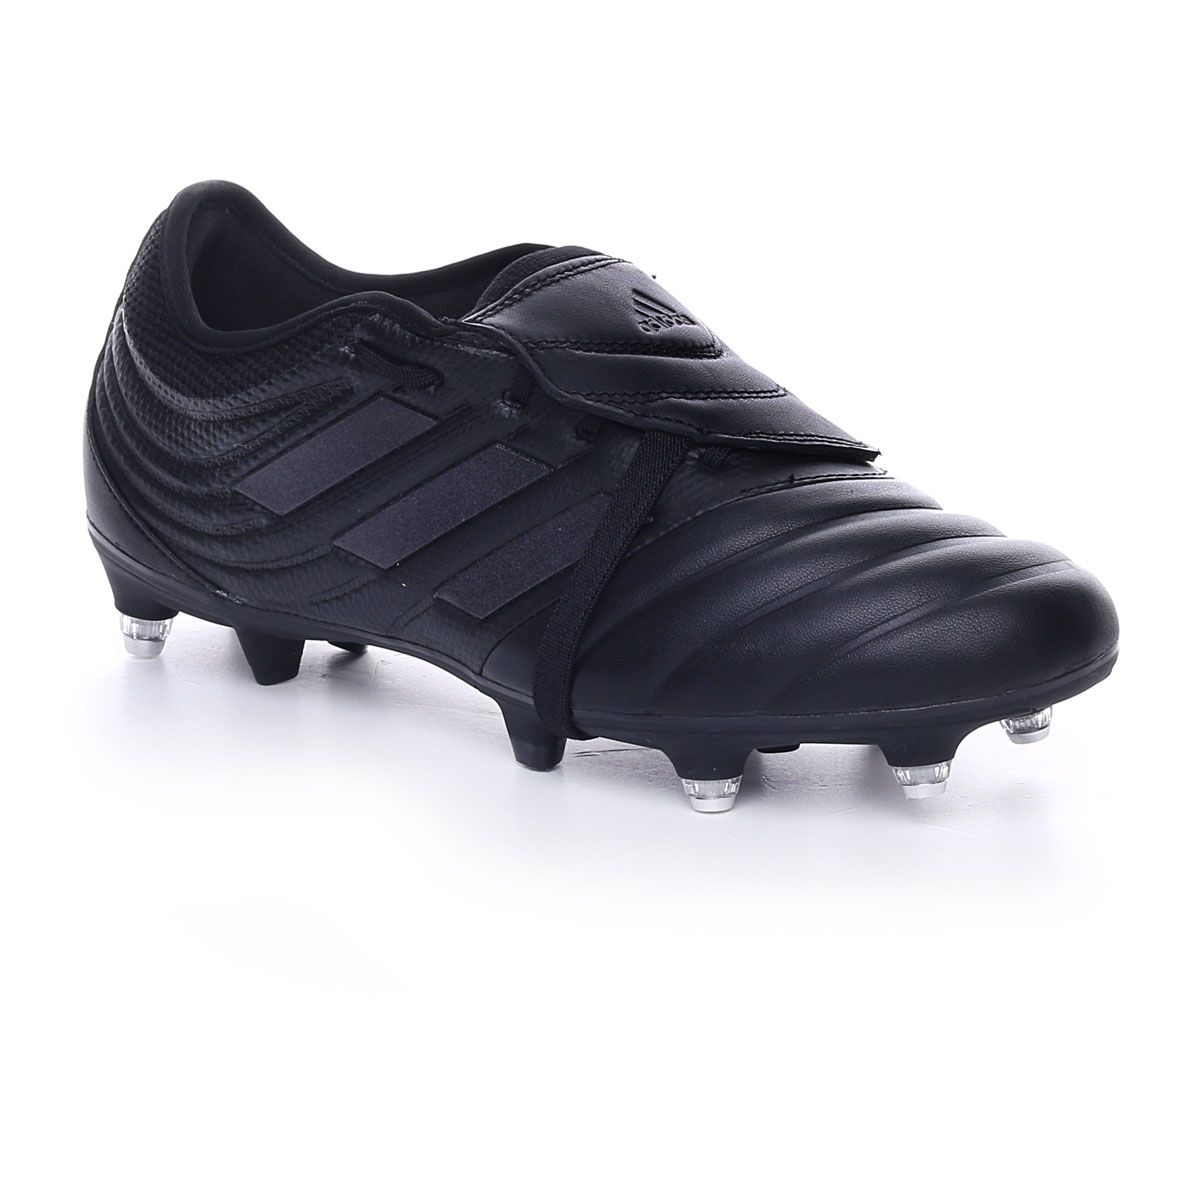 adidas Performance Copa Gloro 19.2 Sg Uomo Core Black